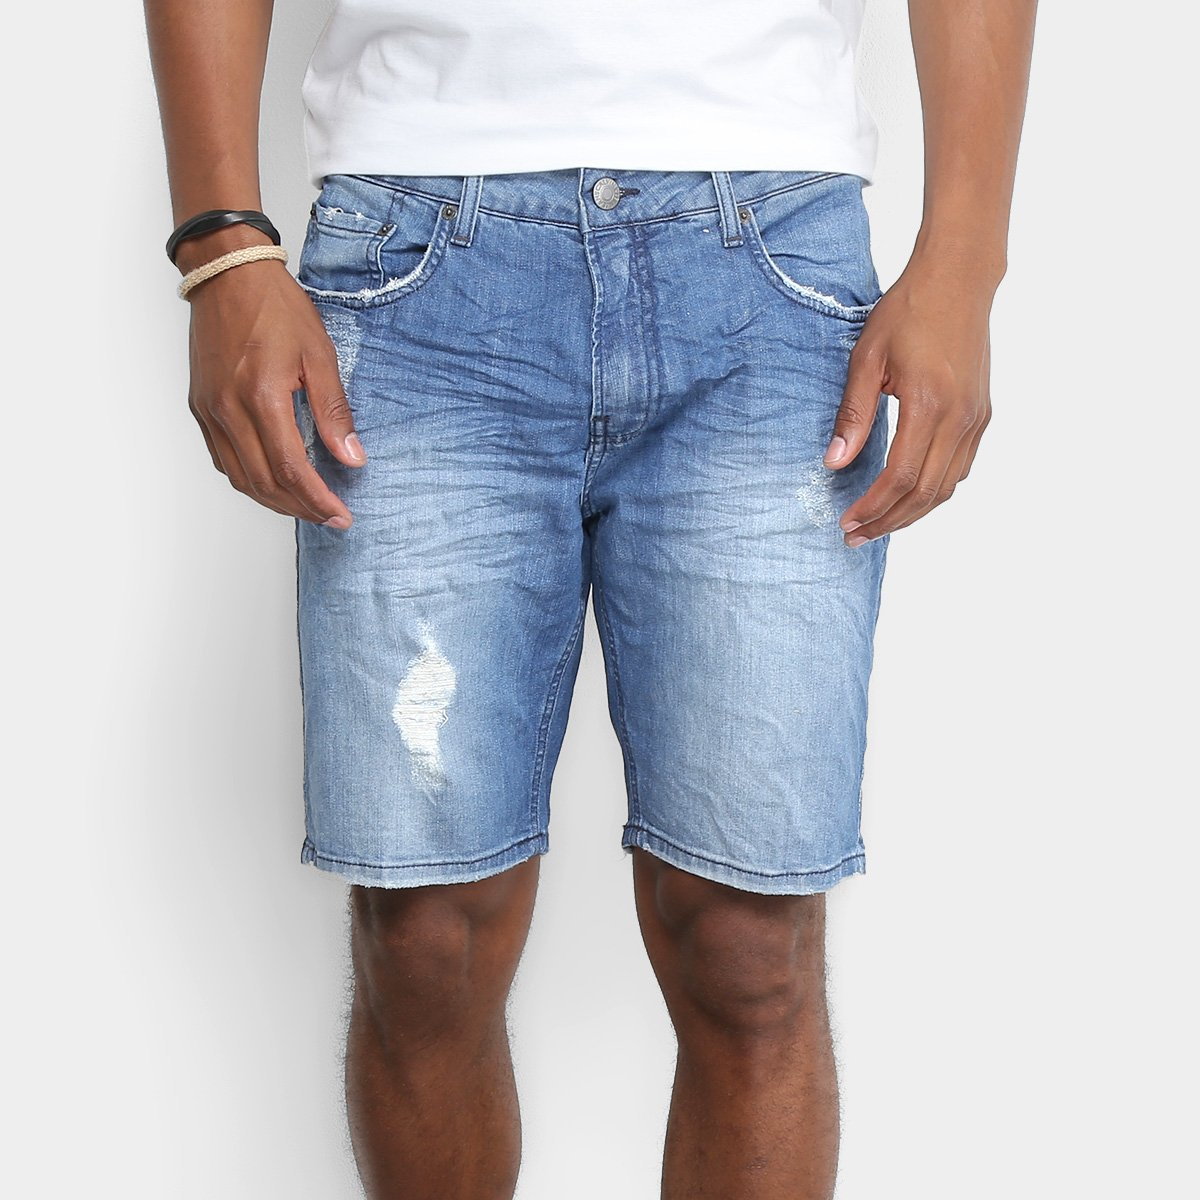 539f77421f6ec Bermuda Jeans Calvin Klein Five Pockets Masculina - Compre Agora ...